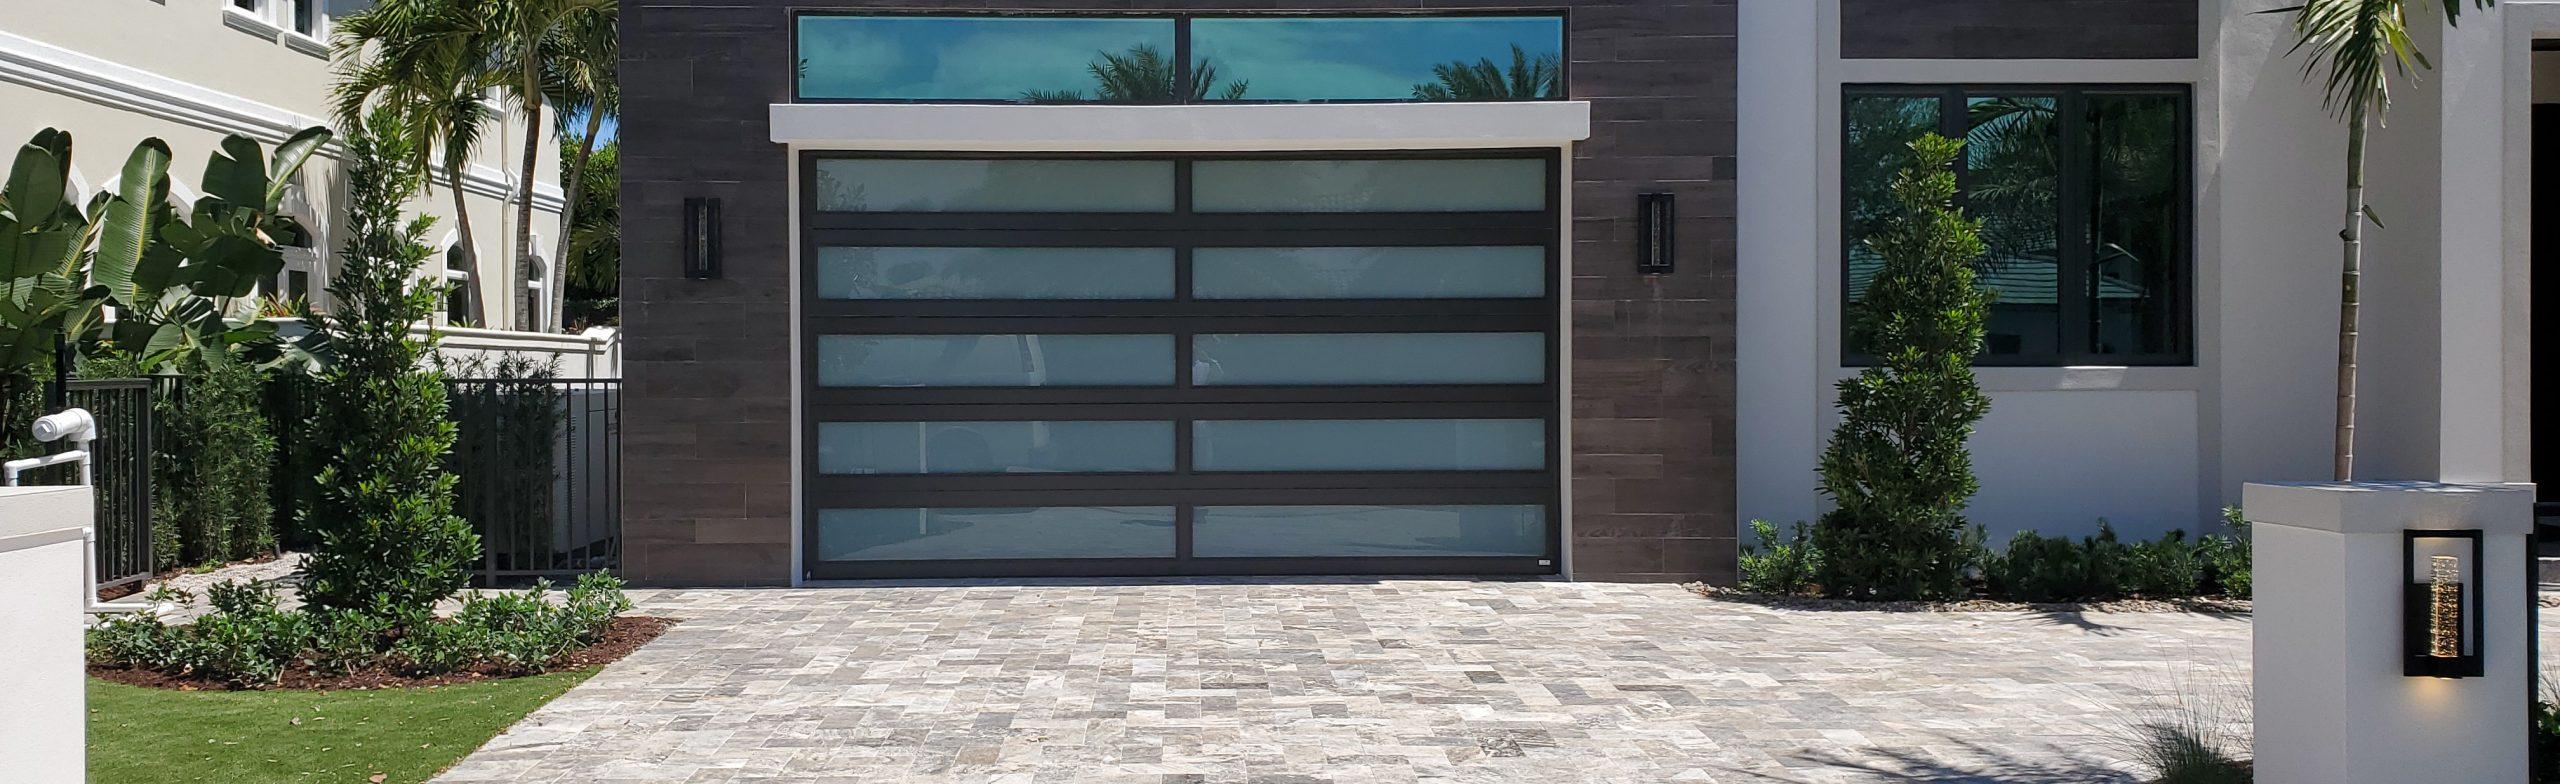 Florida home with large Impact Glass garage door